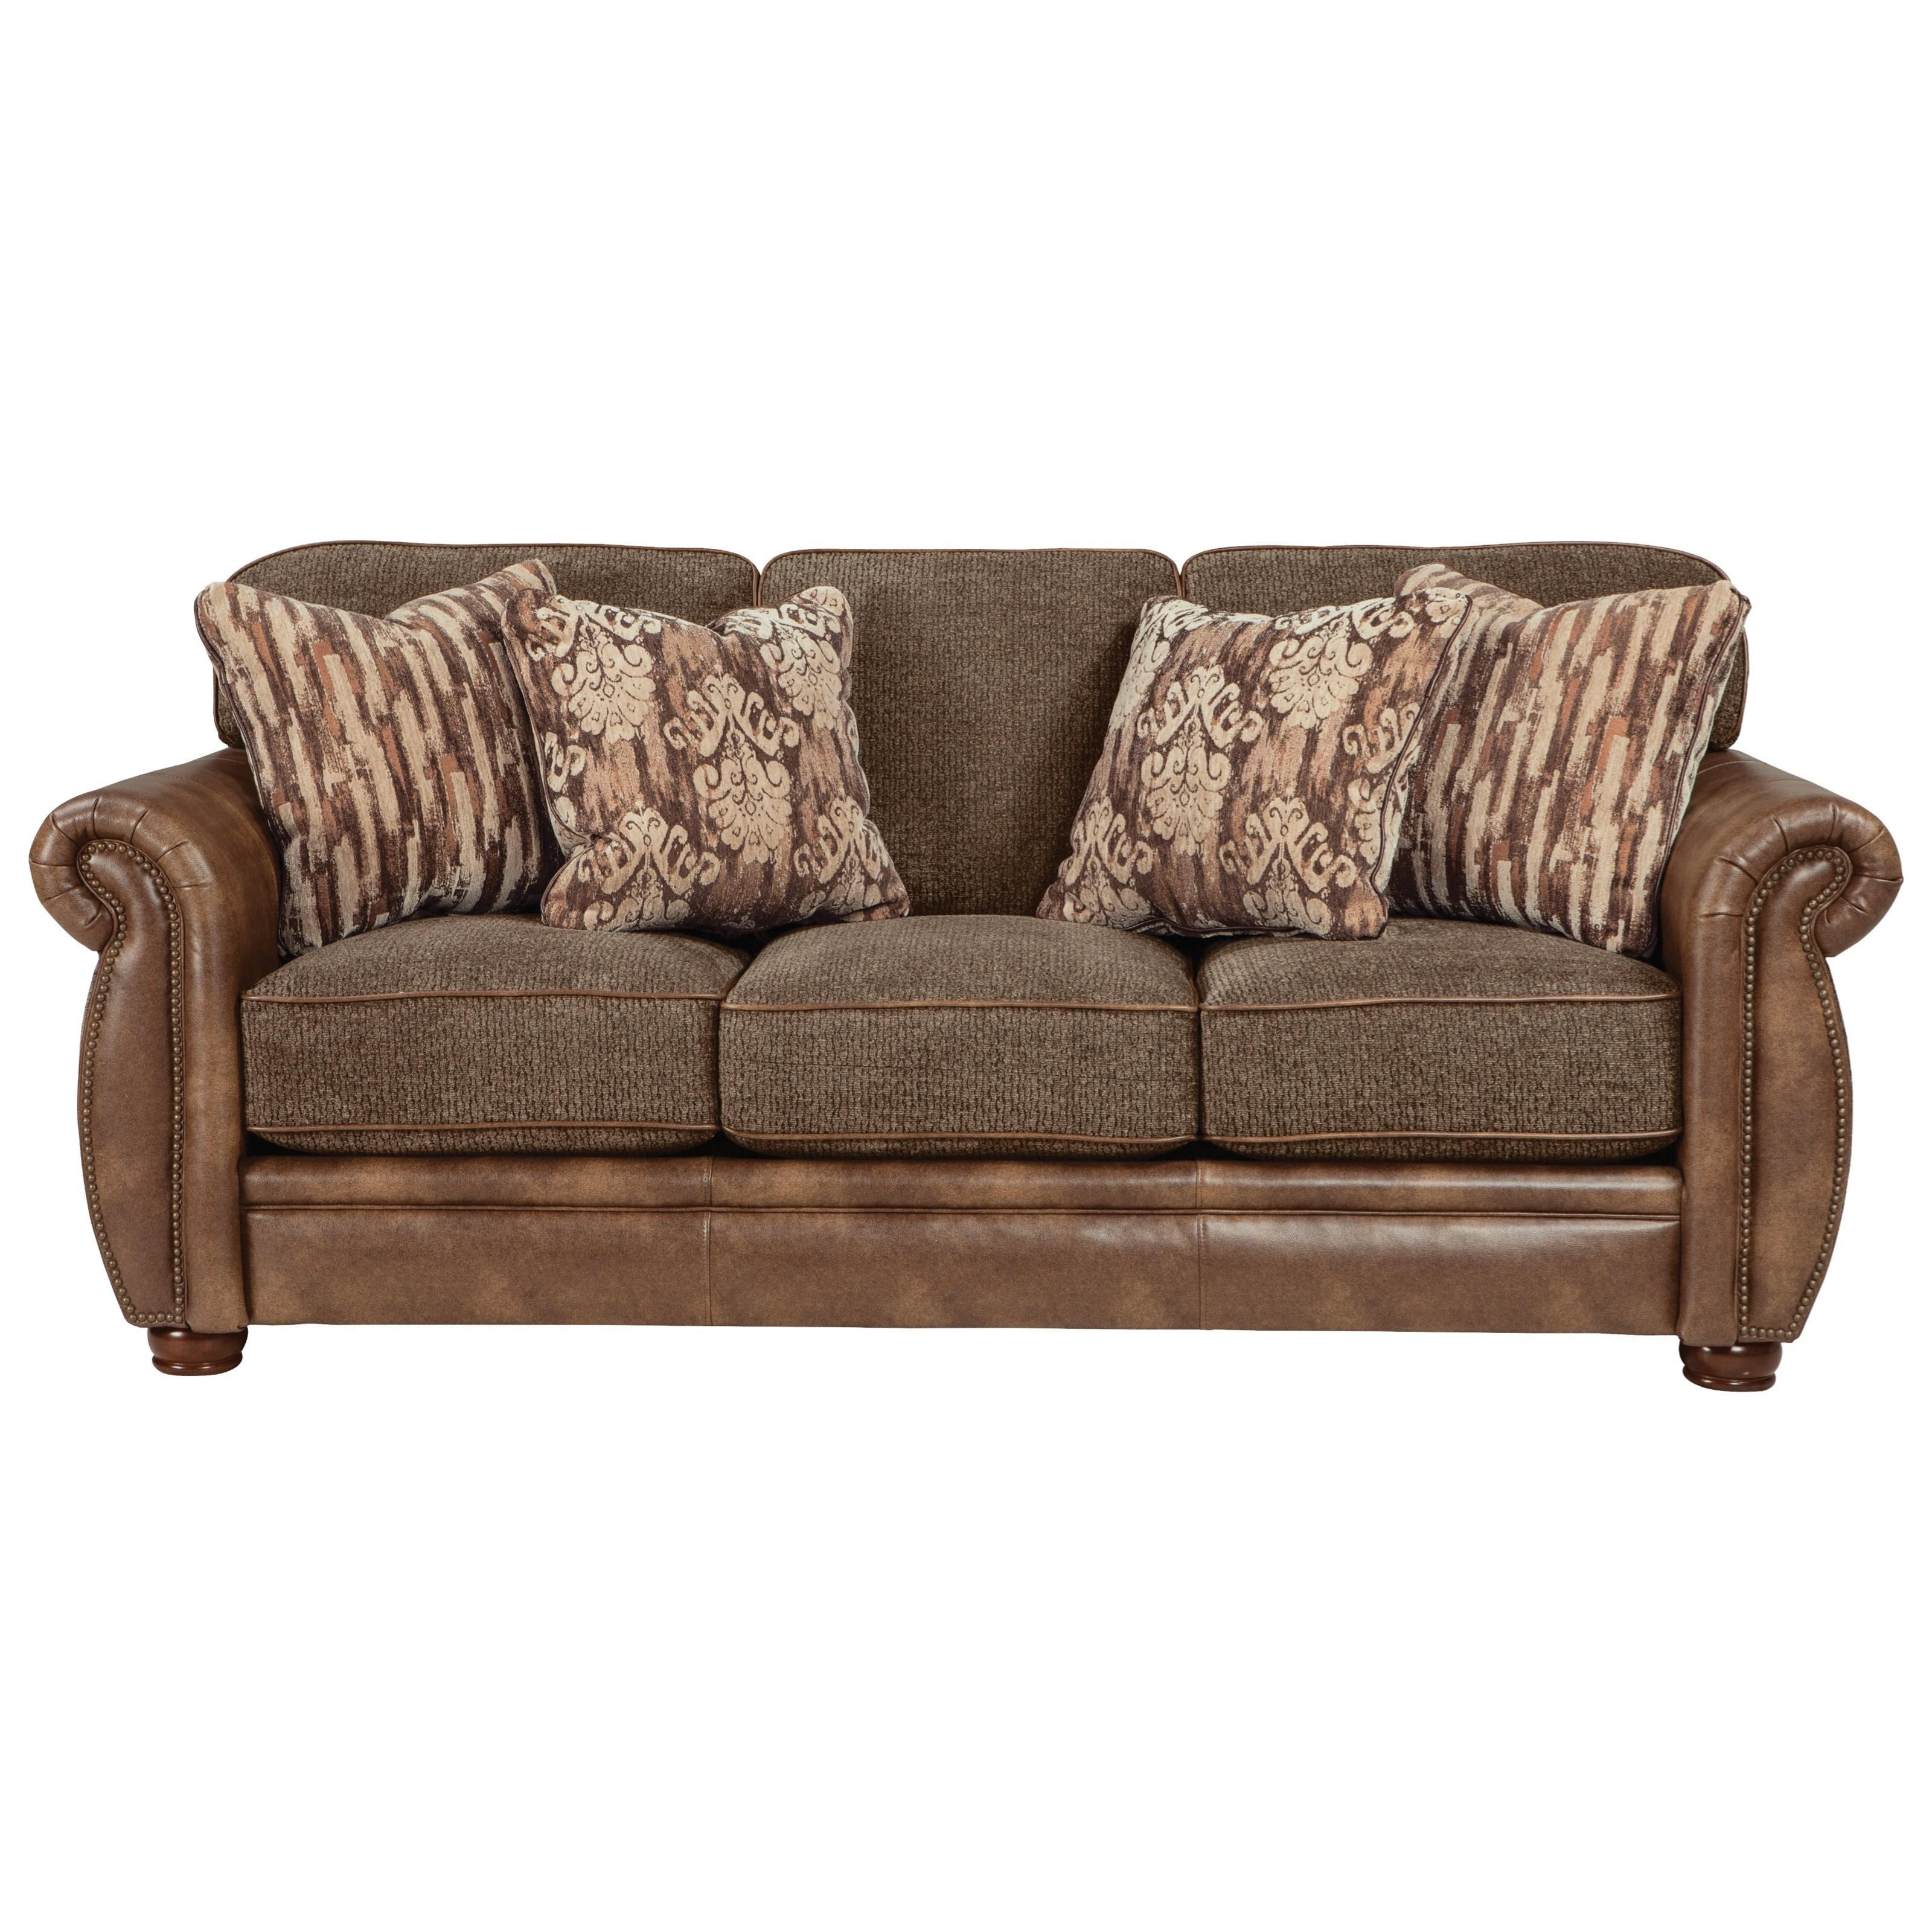 Jackson Furniture PenningtonQueen Sleeper Sofa ...